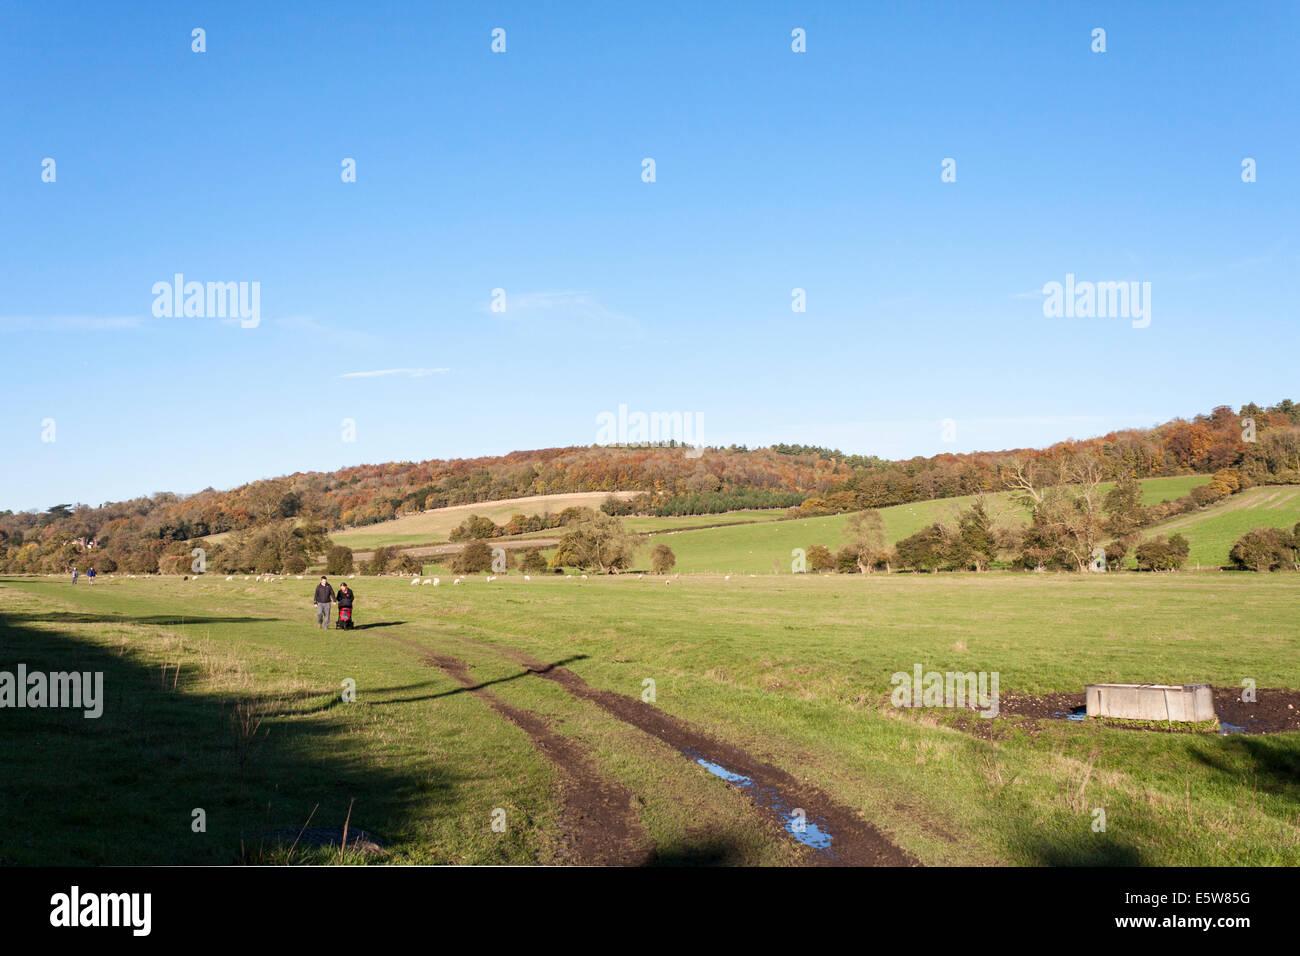 Walkers on the footpath from Hambleden, Buckinghamshire, England, GB, UK. - Stock Image